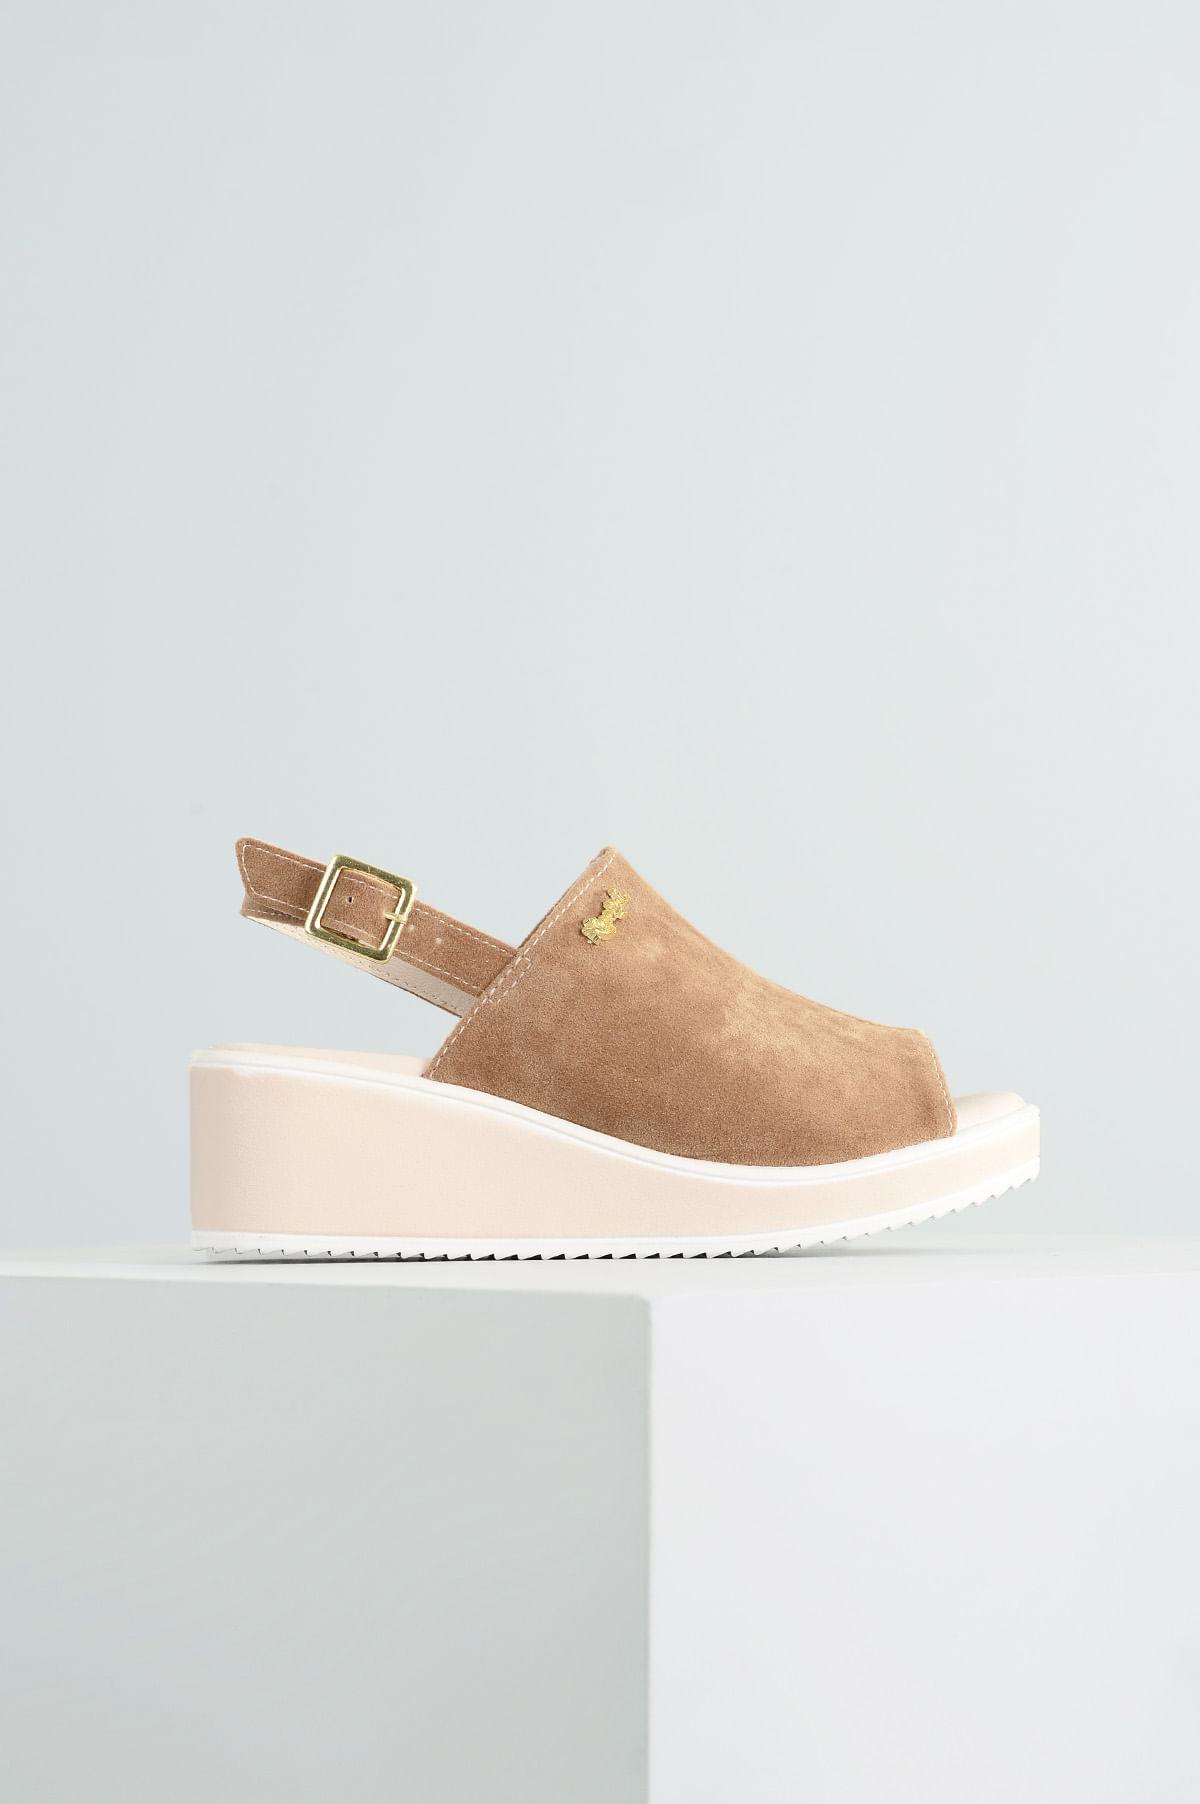 3c91743914 Sandália Infantil Anabela Yasmin Klassipé CAM - BEGE - Mundial Calçados